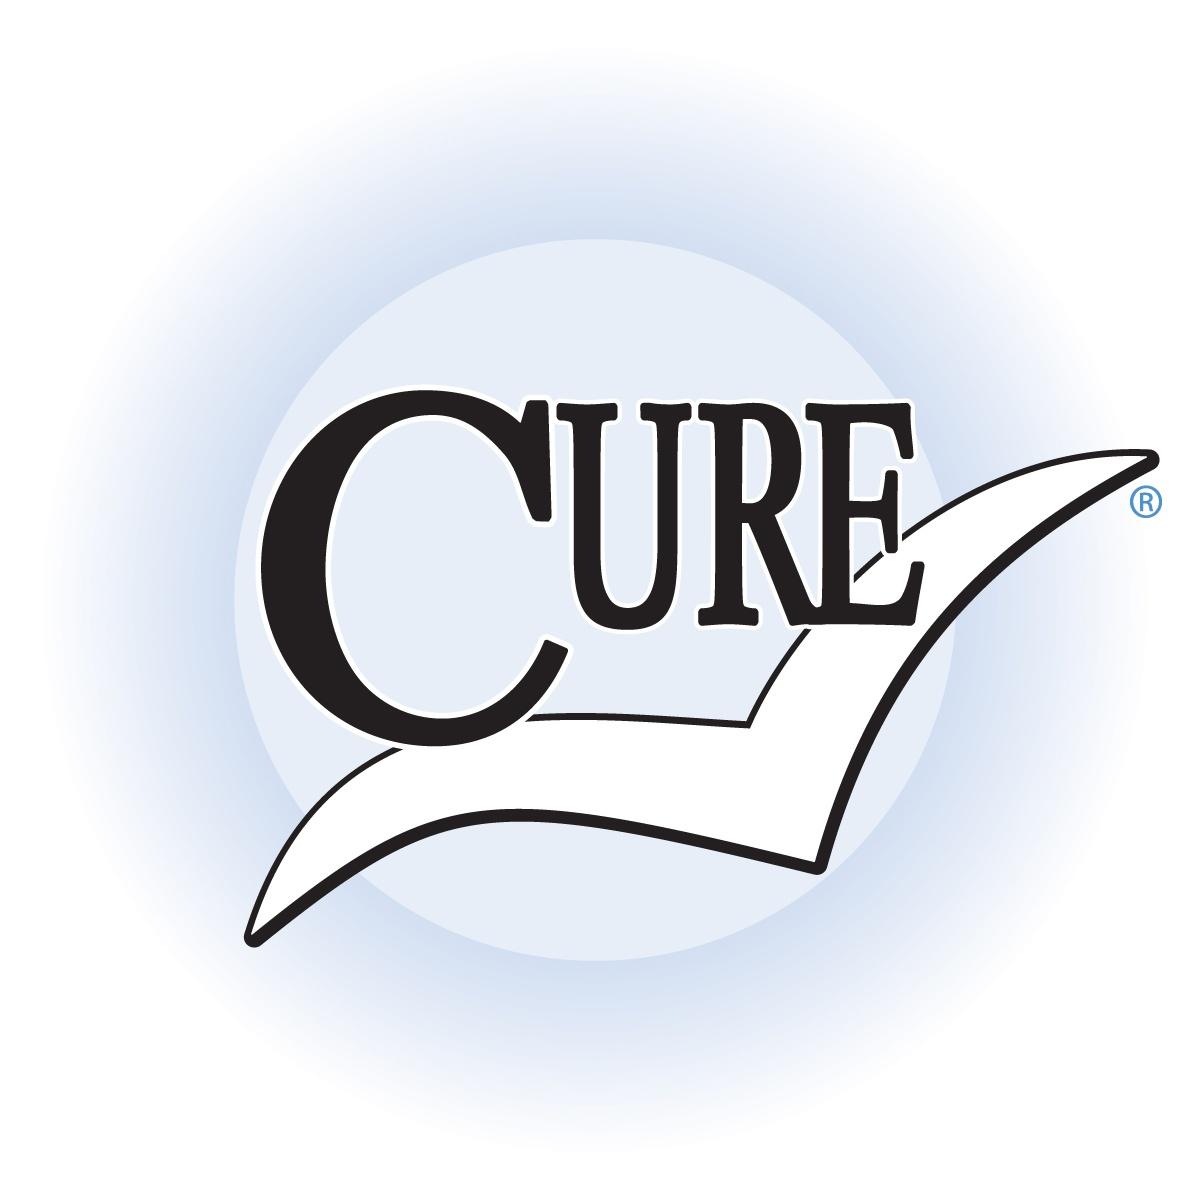 CureMedicalLogo.jpg